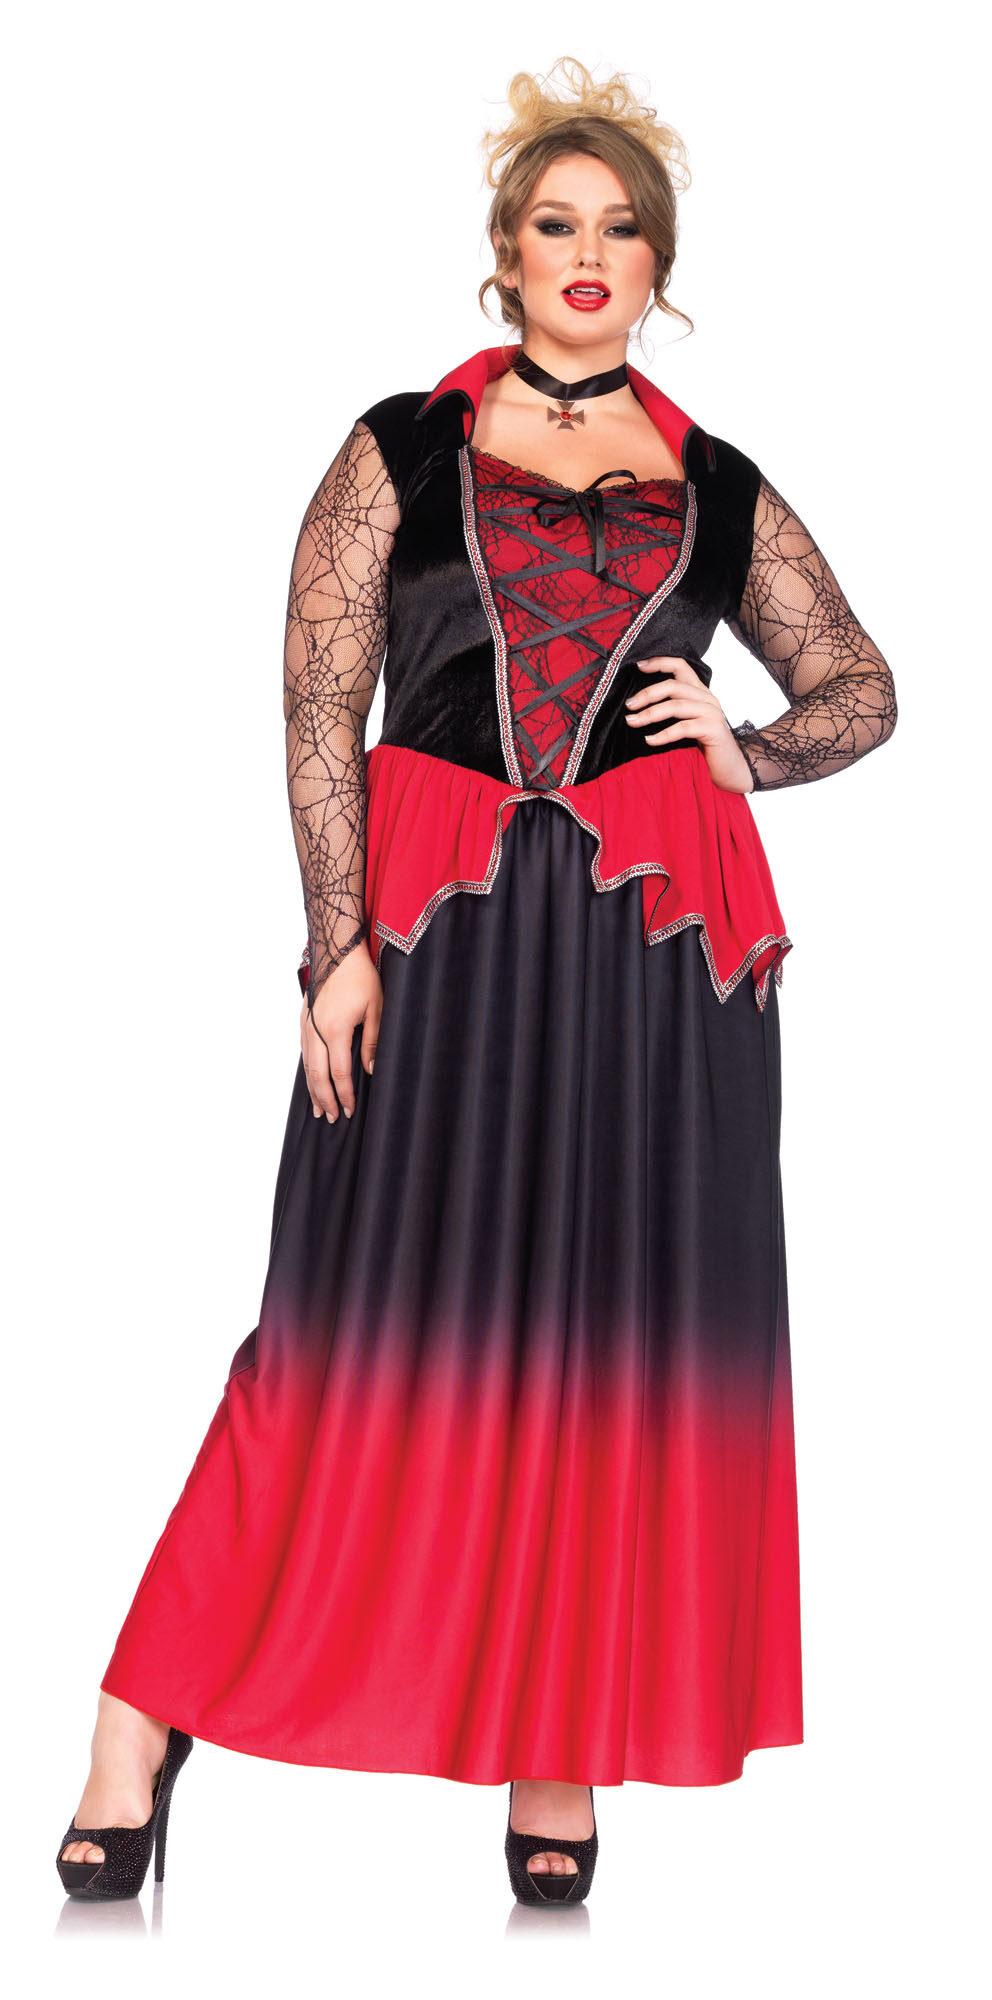 a98e4ff27c Just Bitten Vampire Beauty Plus Size Costume - Mr. Costumes